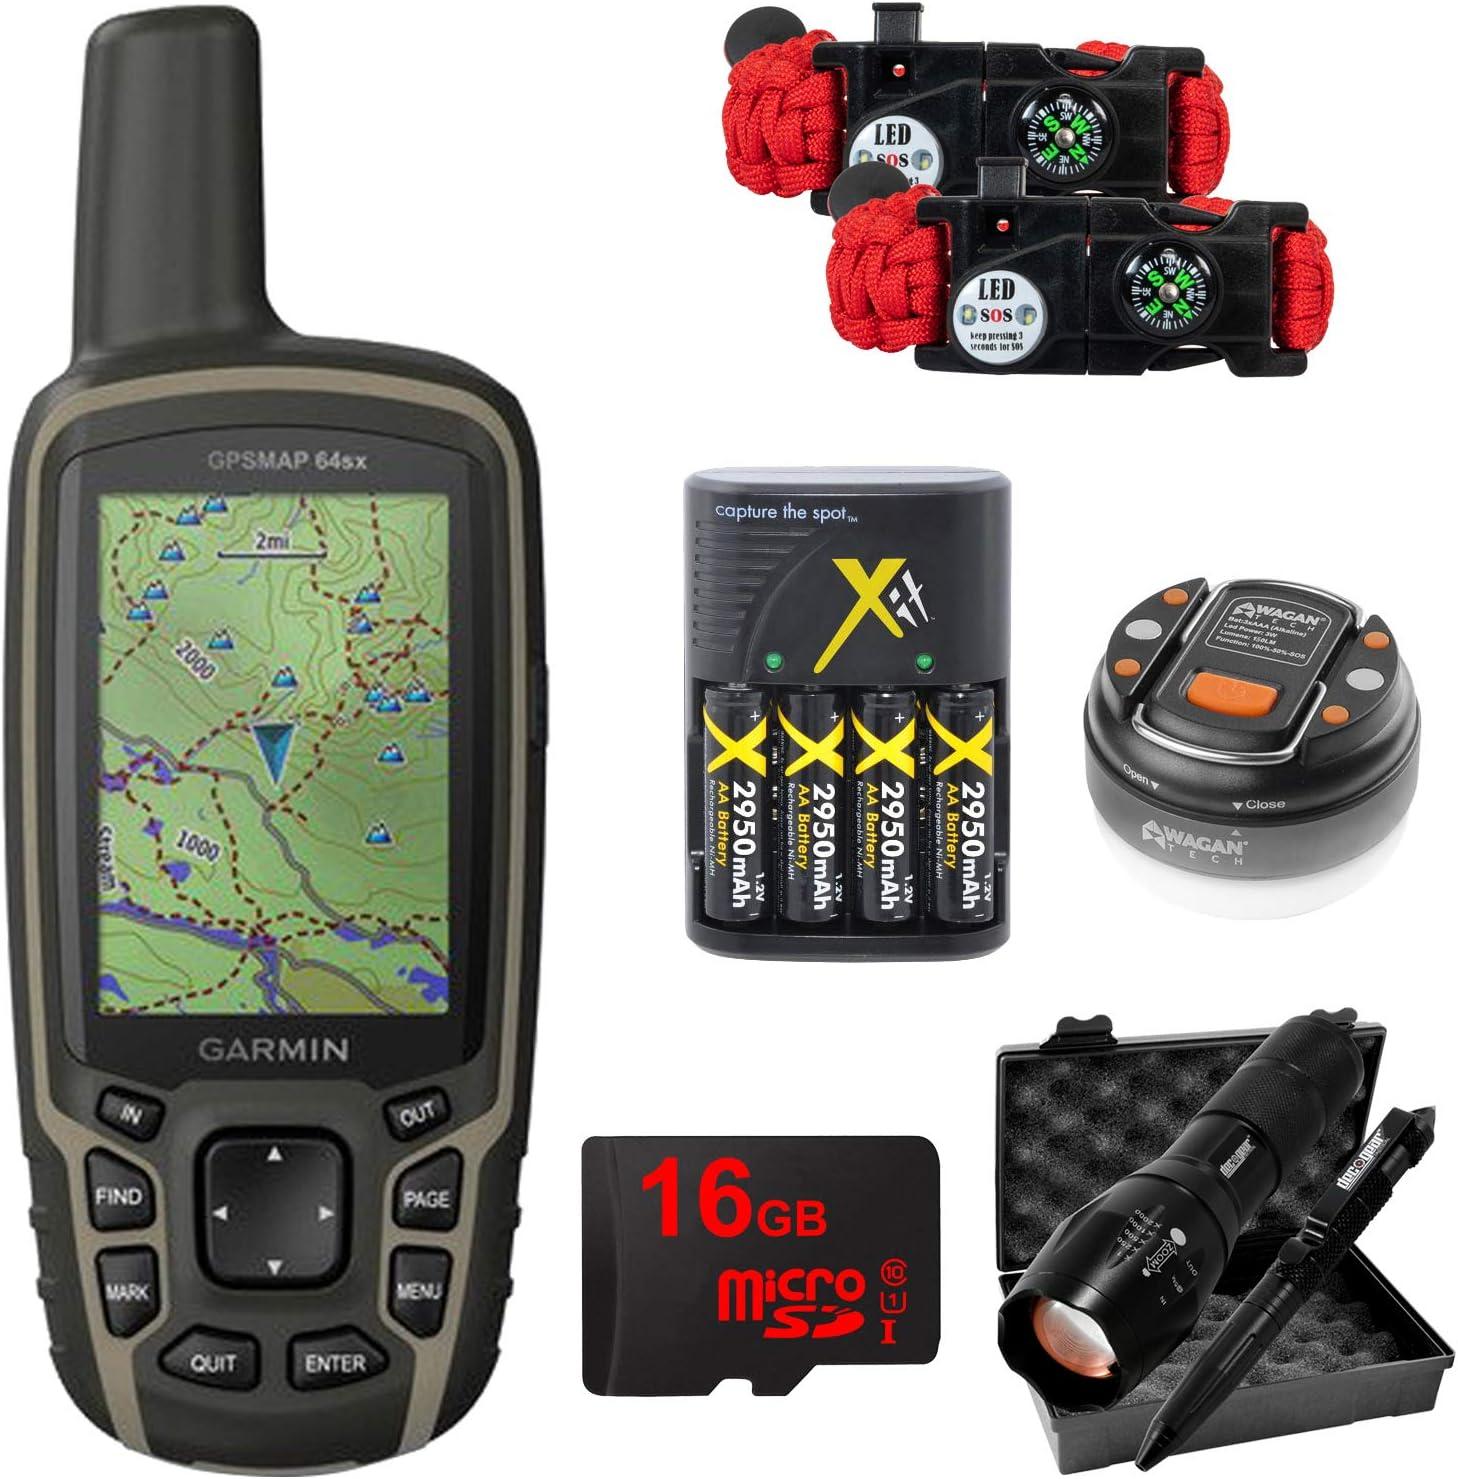 Garmin GPSMAP 64sx Handheld GPS with 16GB Camping & Hiking ...